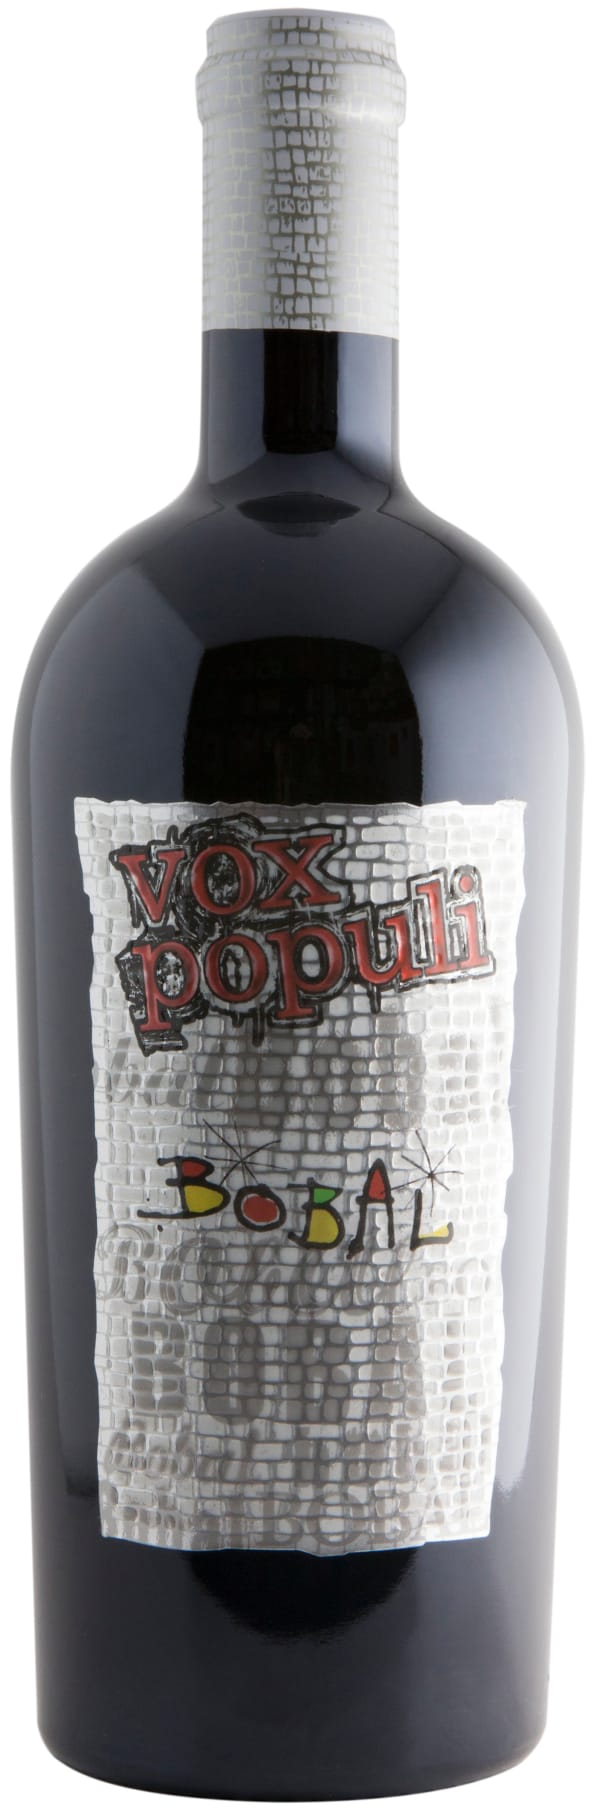 Vox Populi Bobal 2014